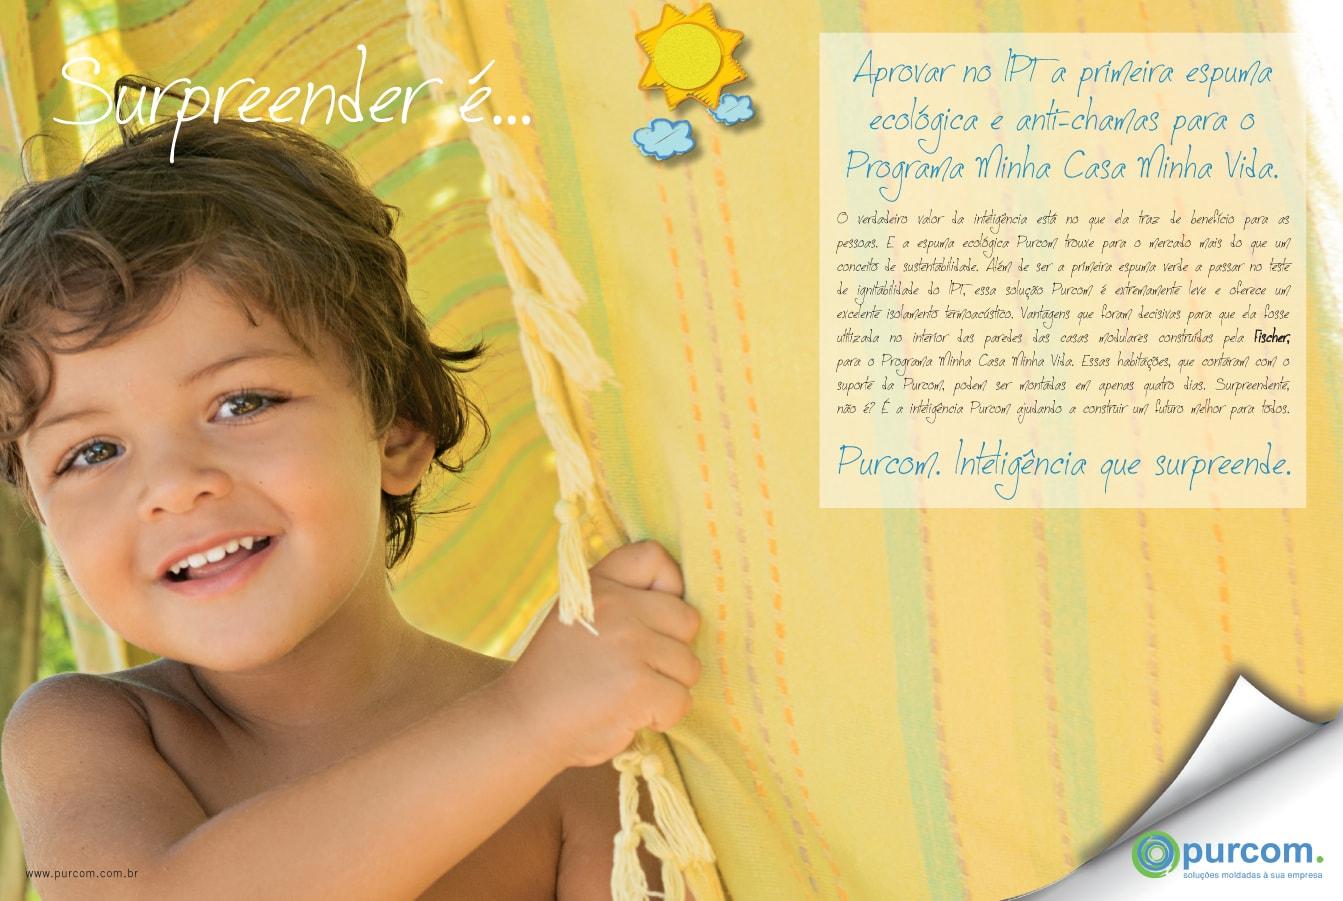 Approving at IPT the first ecological and flame-retardant foam for Minha Casa Minha Vida.